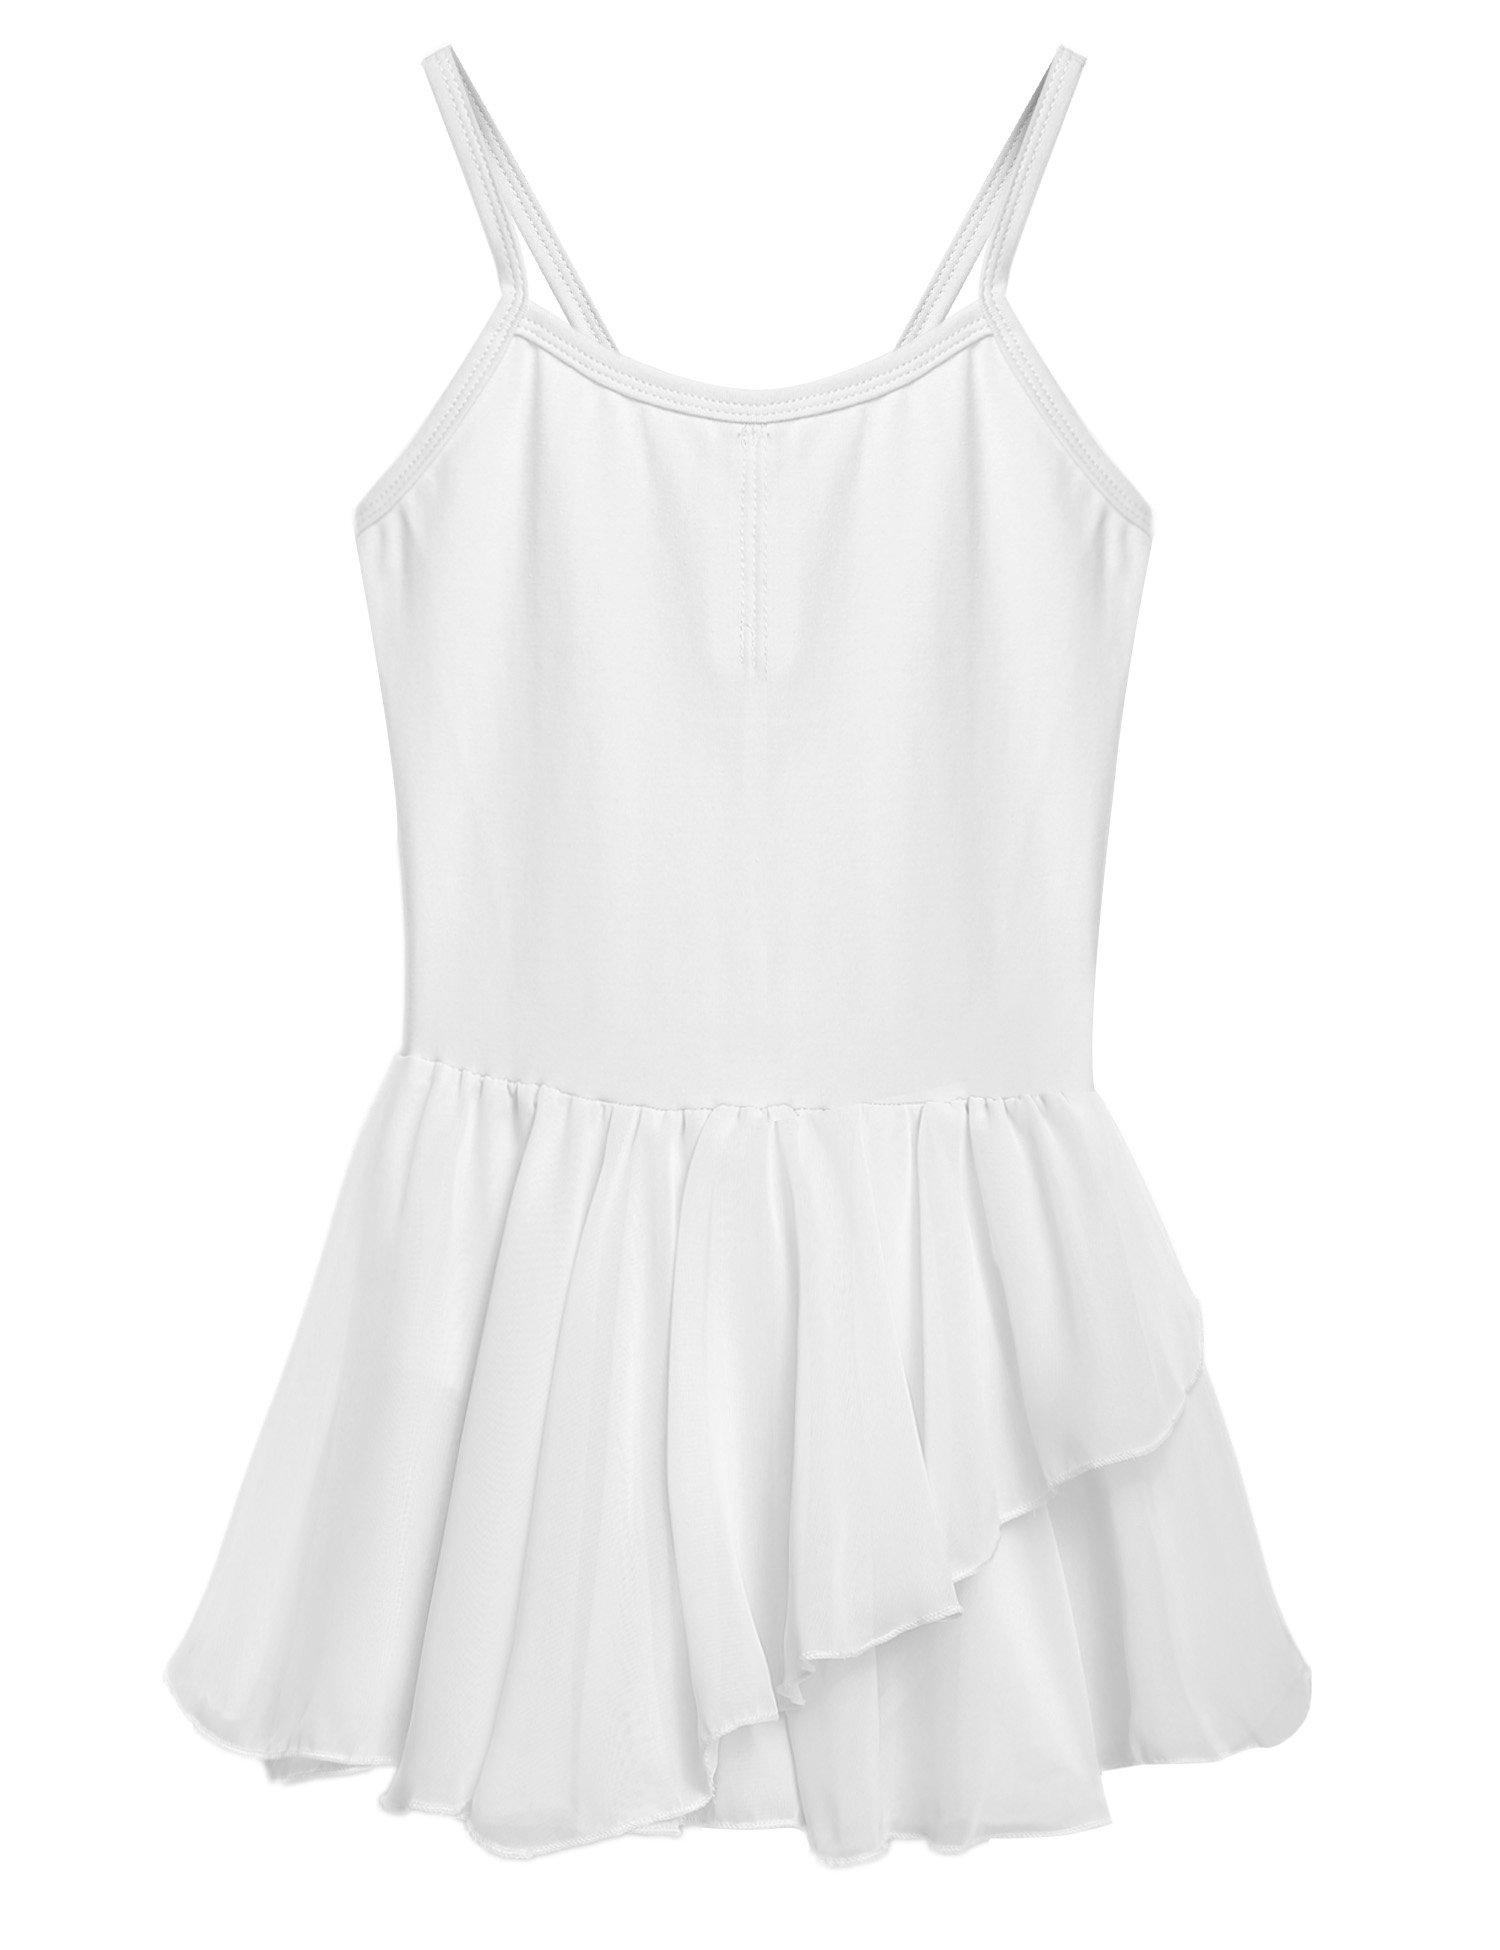 Arshiner Girls Ballet Dress Skirt Camisole Leotard